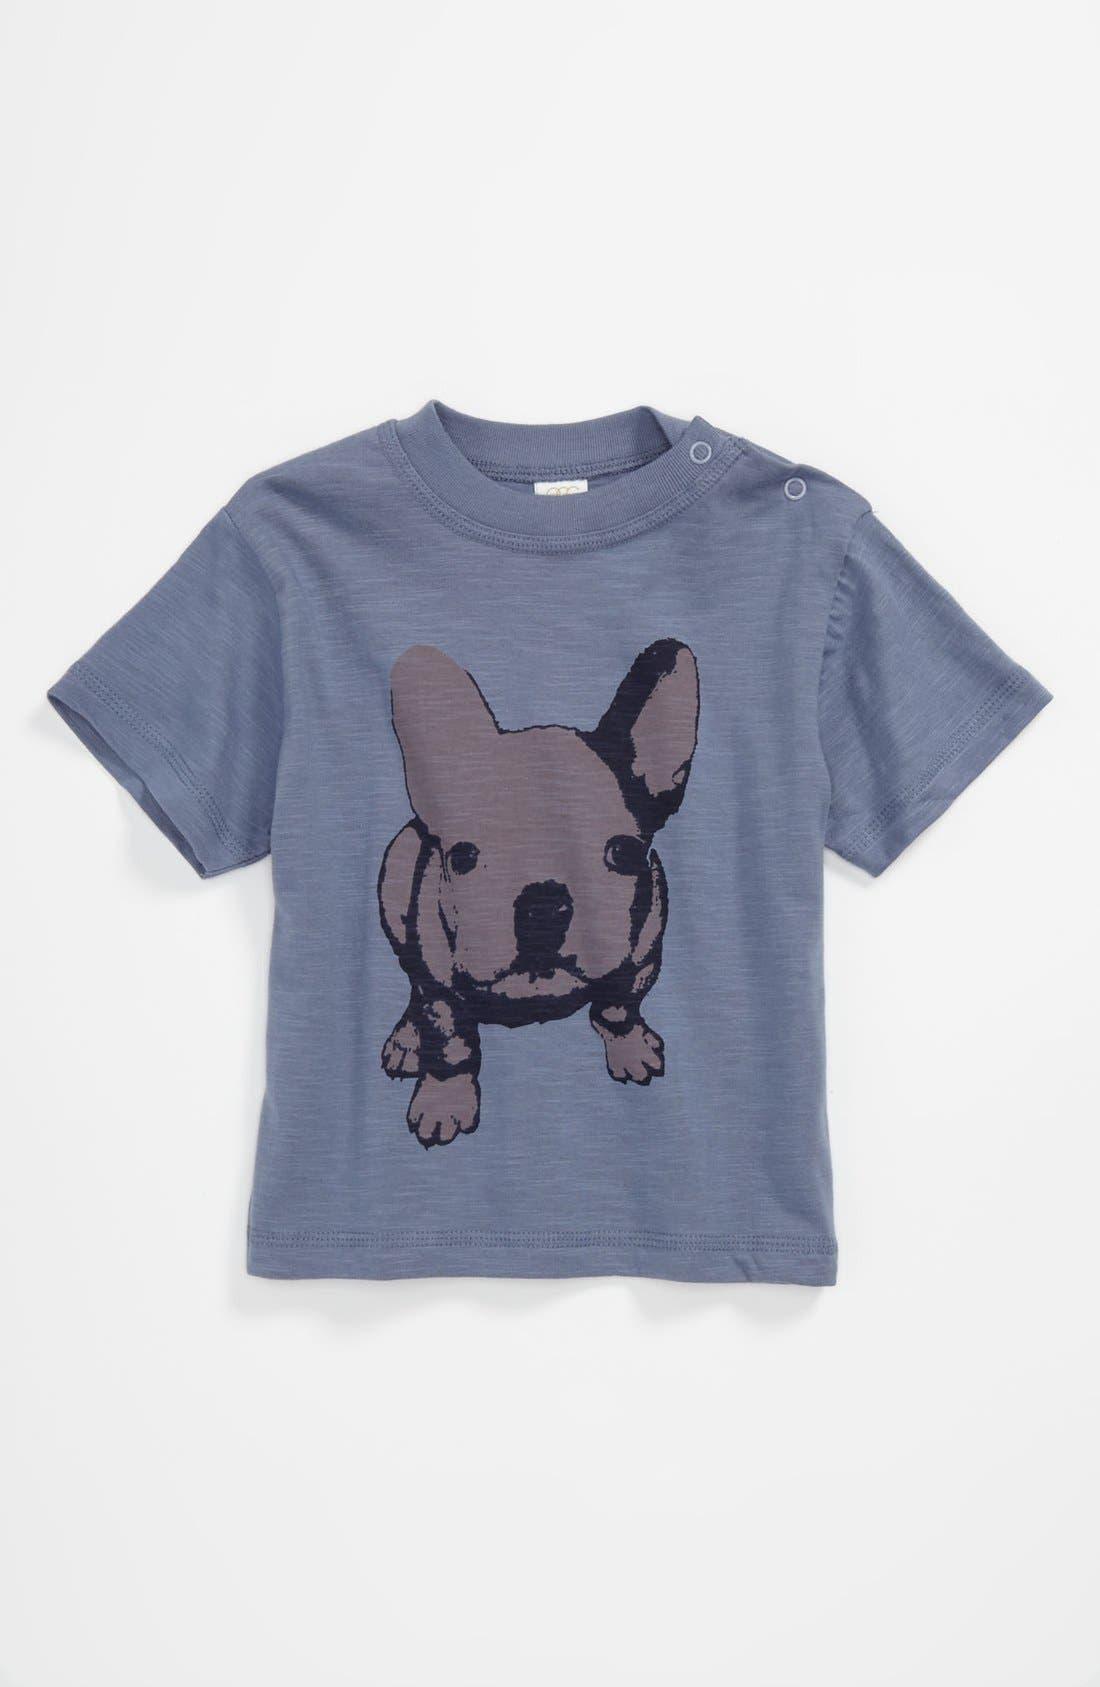 Main Image - egg by susan lazar Jersey T-Shirt (Toddler)